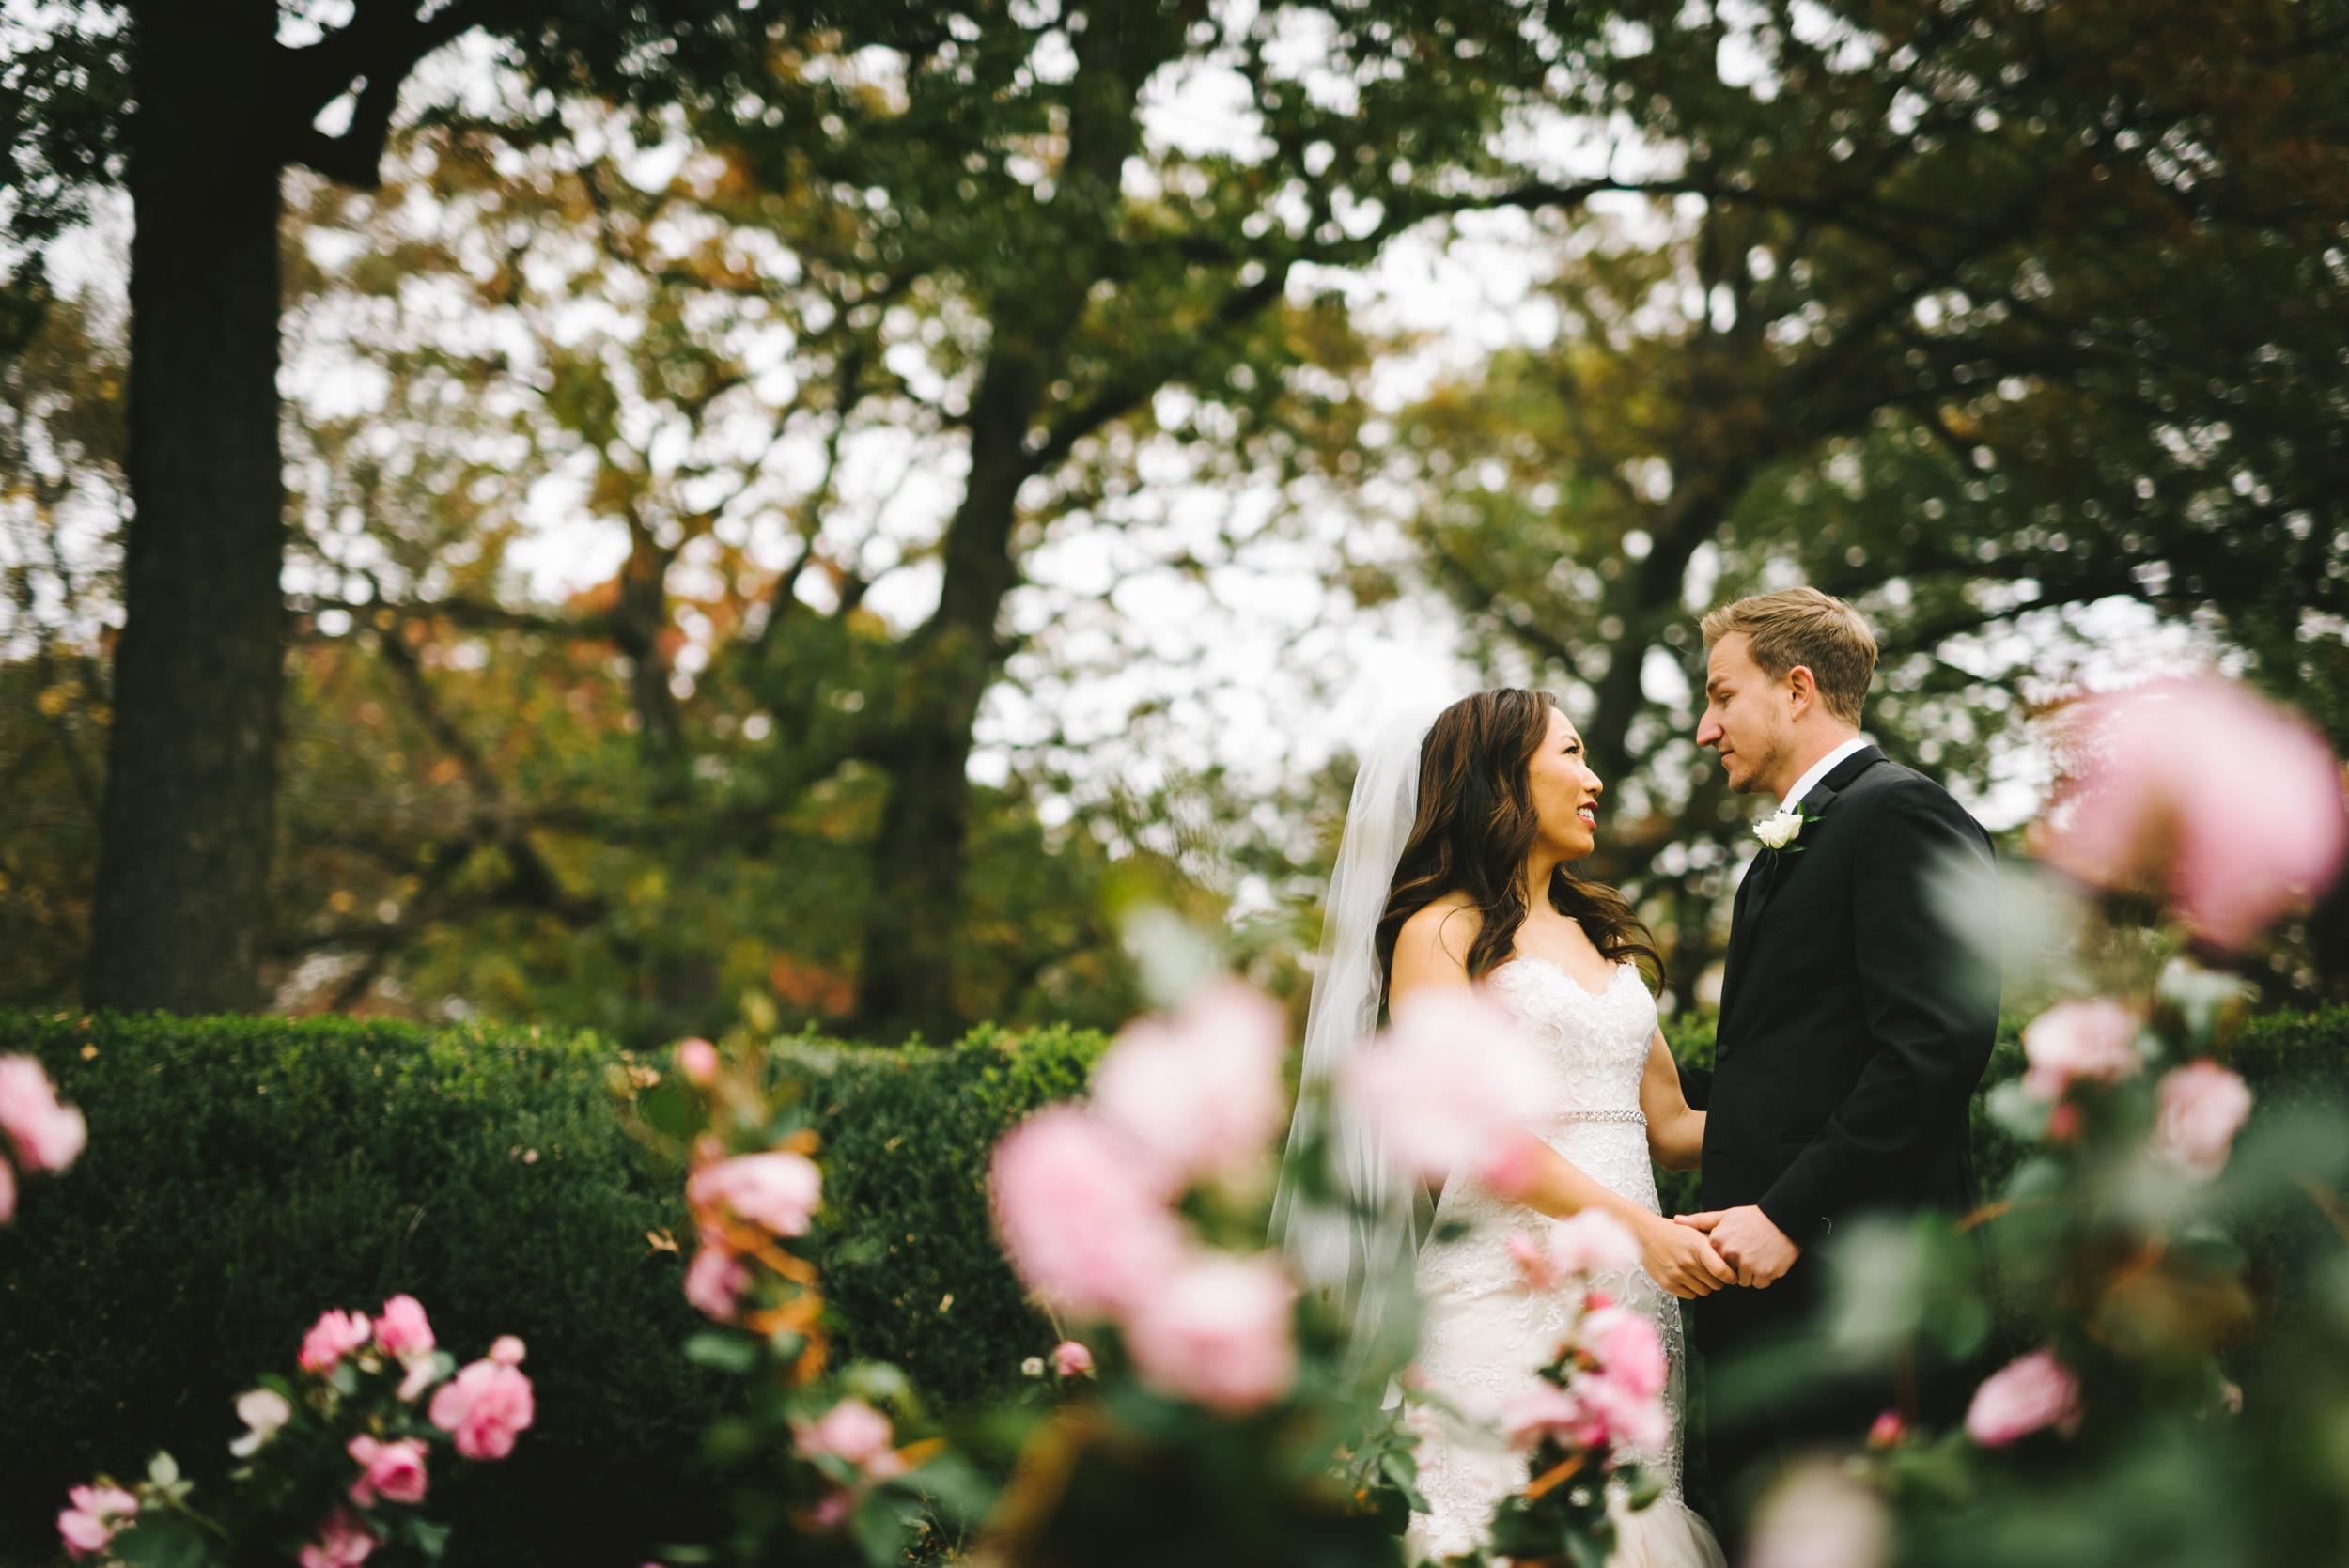 20171029_Wedding-Kristin-Garrett-178.jpg